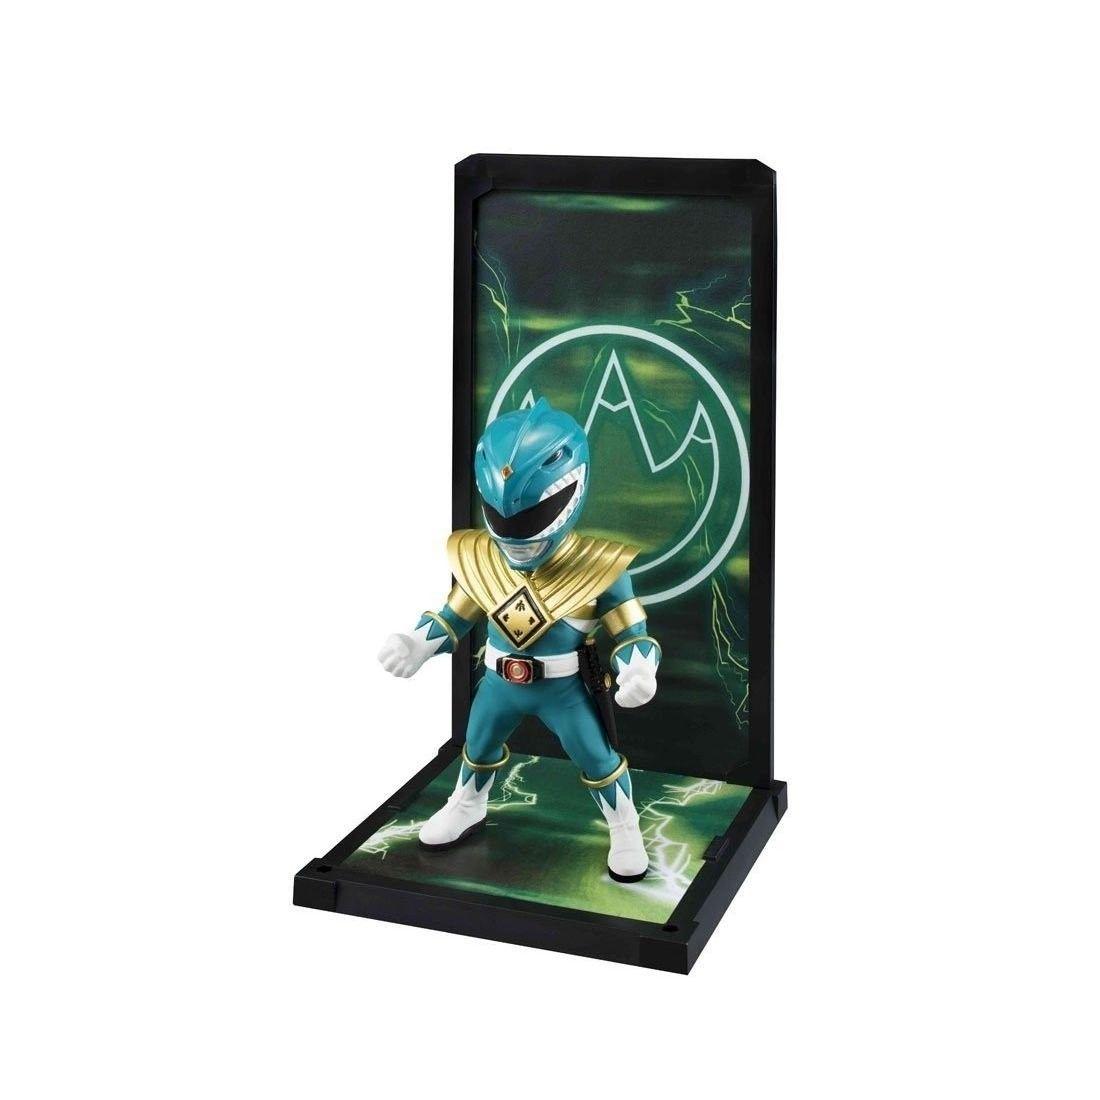 Miniatura Ranger Verde: Power Rangers Tamashii Buddies - Bandai